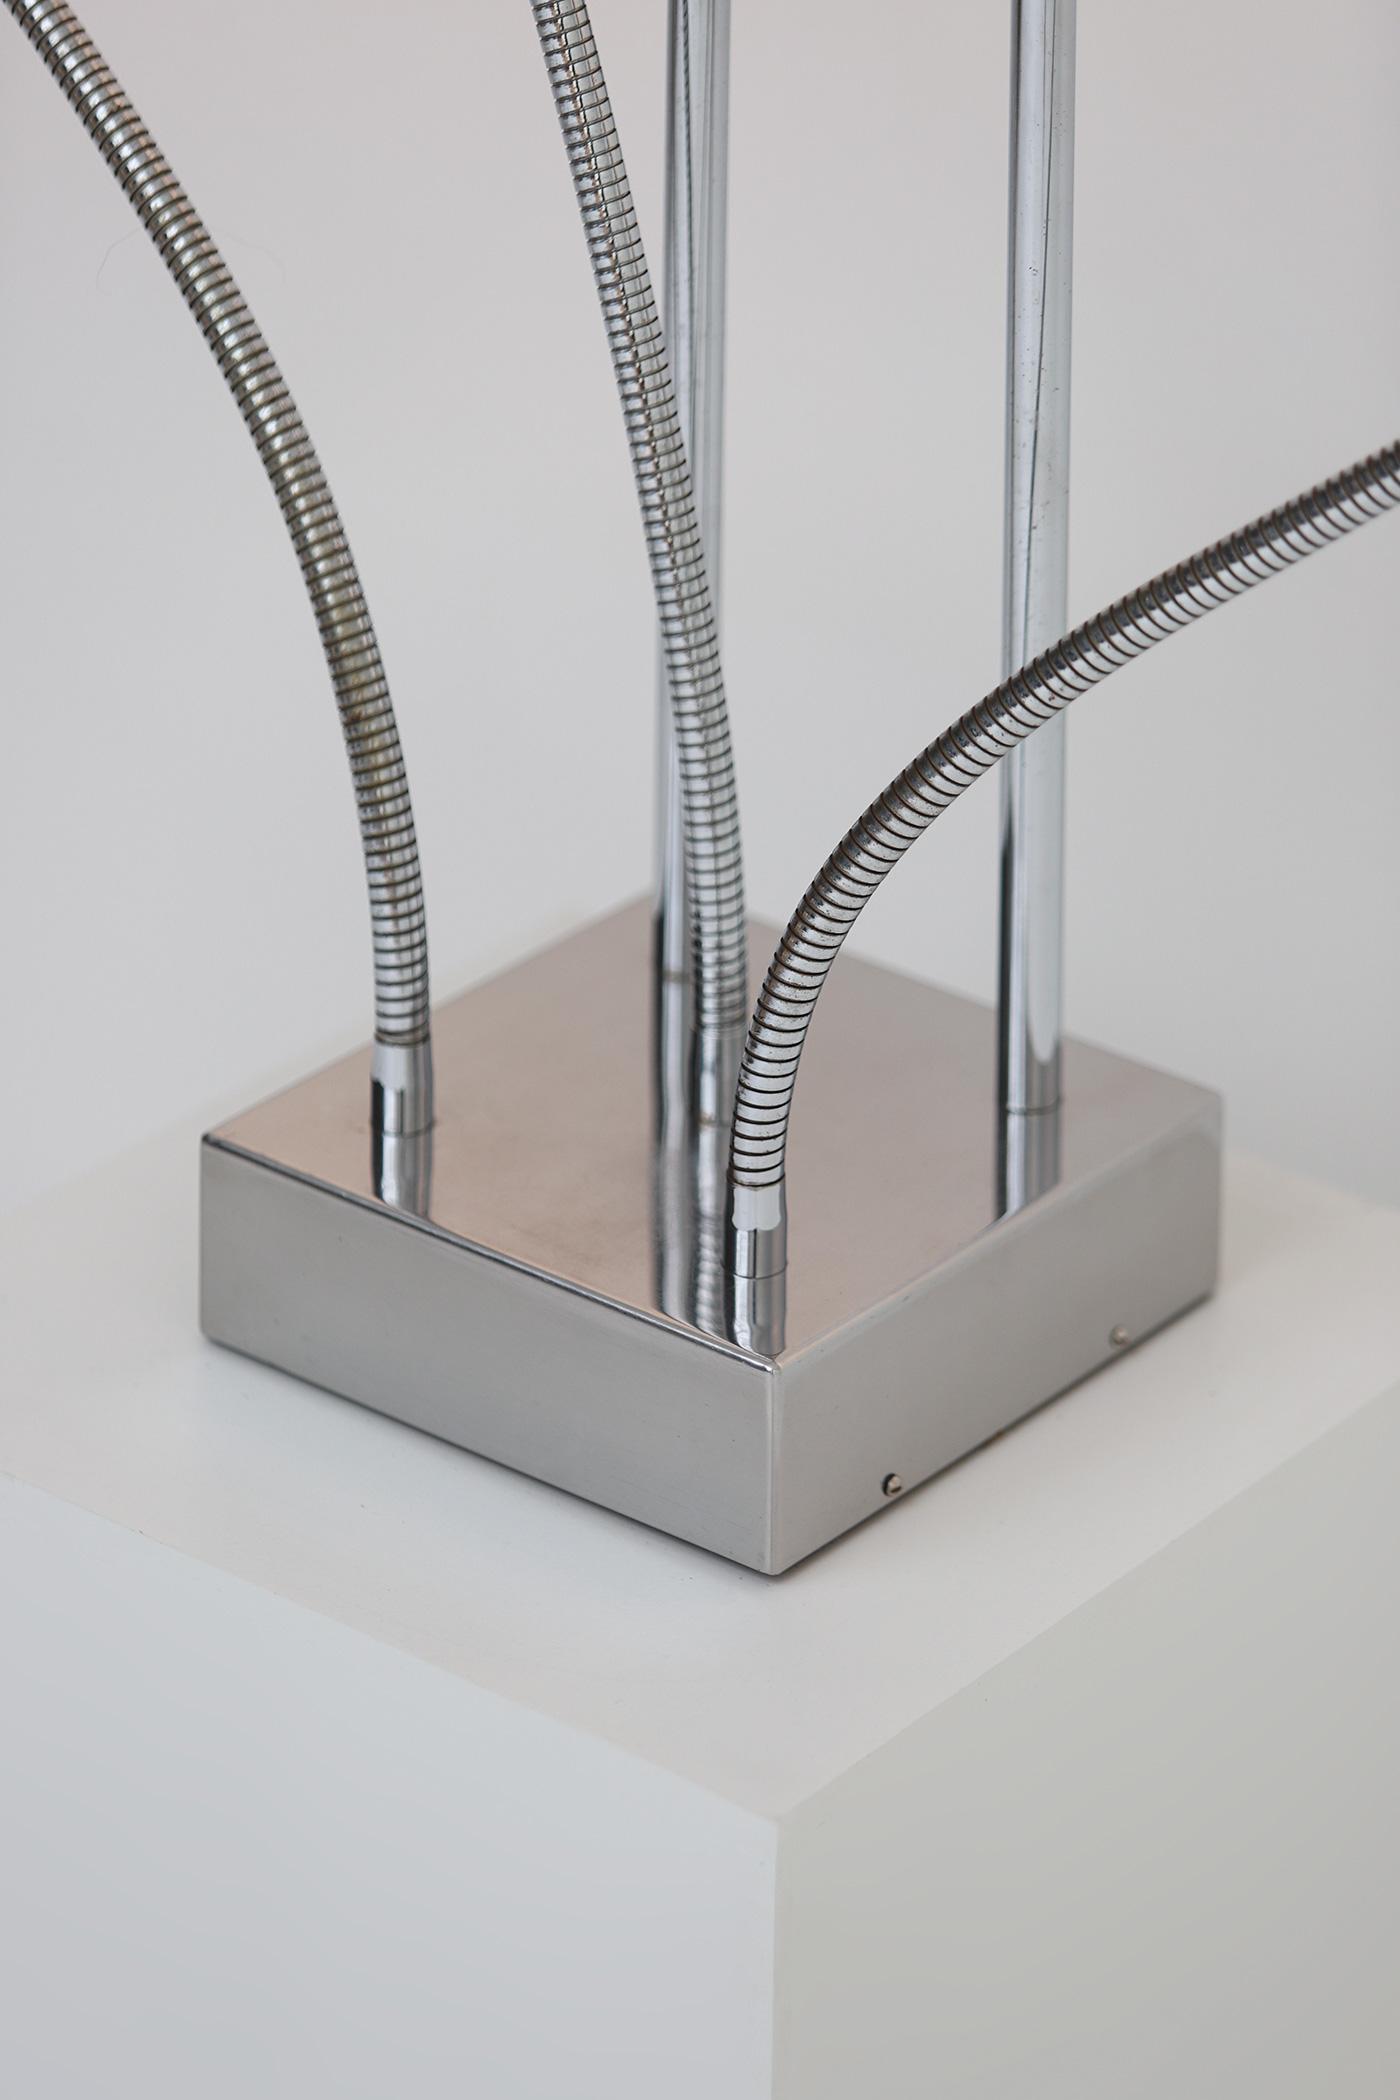 Pierre Folie Hydra floor lamp for Jacques Charpentierimage 5